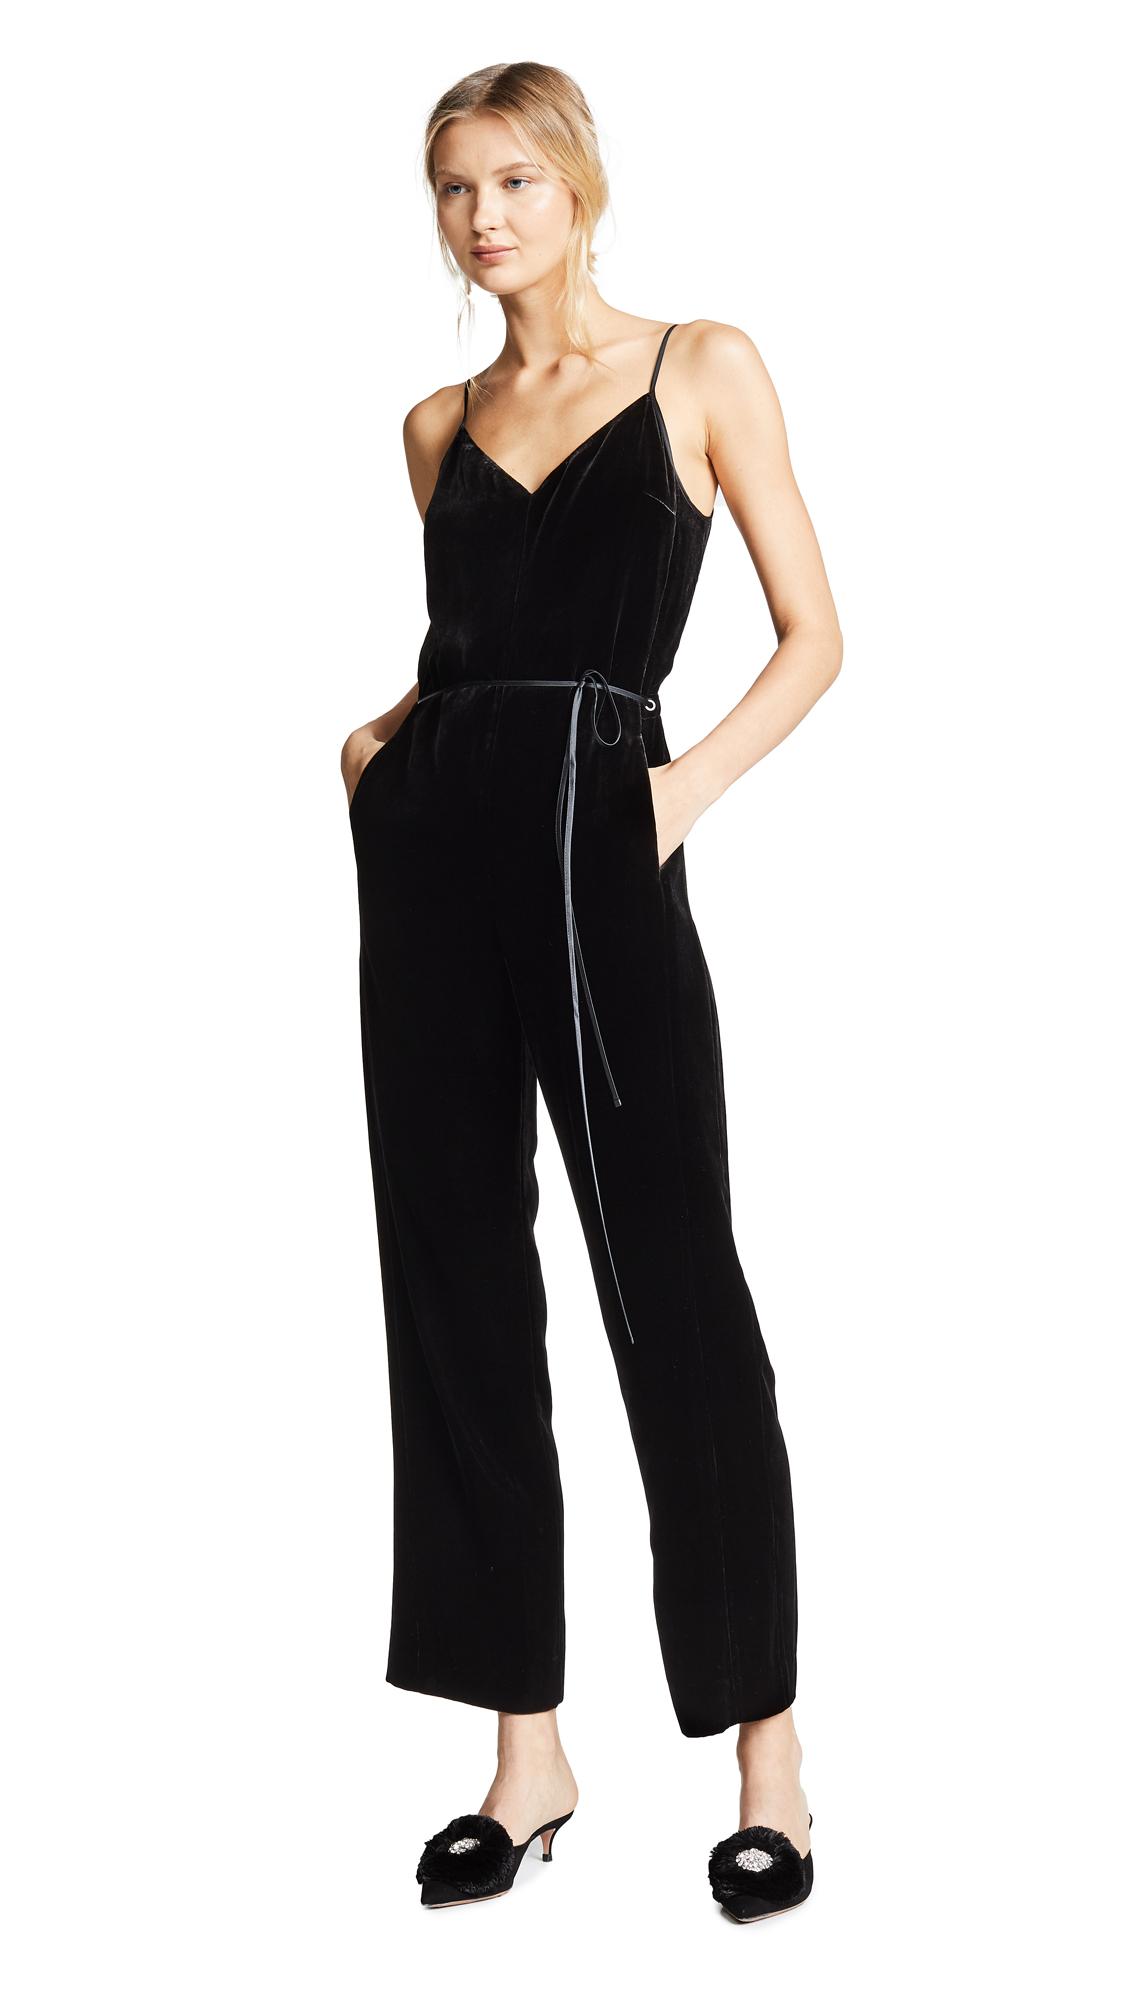 Jamie Velvet Jumpsuit - Black Size 8